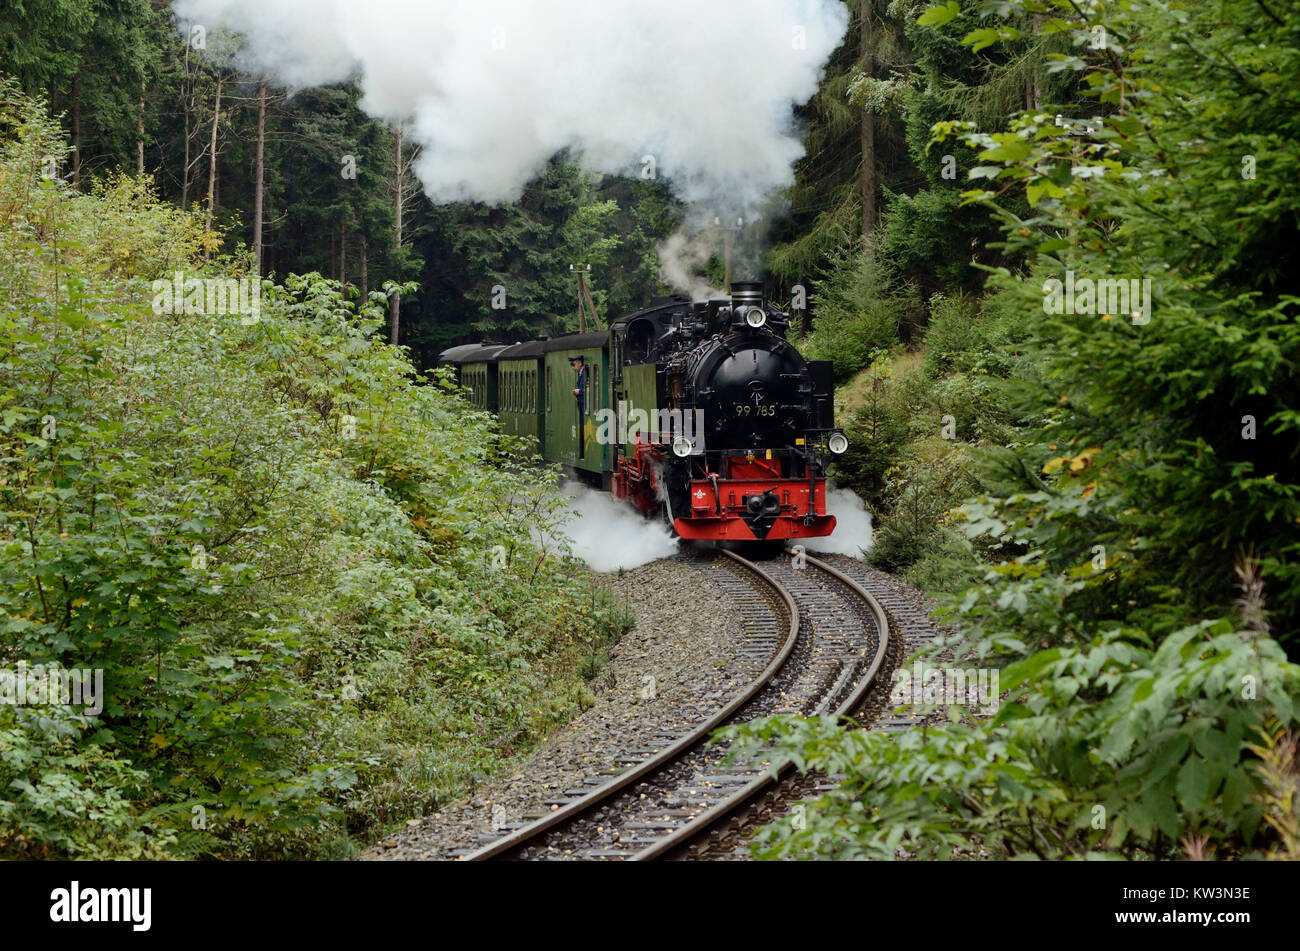 The middle Erzgebirge, Fichtelbergbahn in the increase with Kretscham Rothensehma, Mittleres Erzgebirge, Fichtelbergbahn - Stock Image